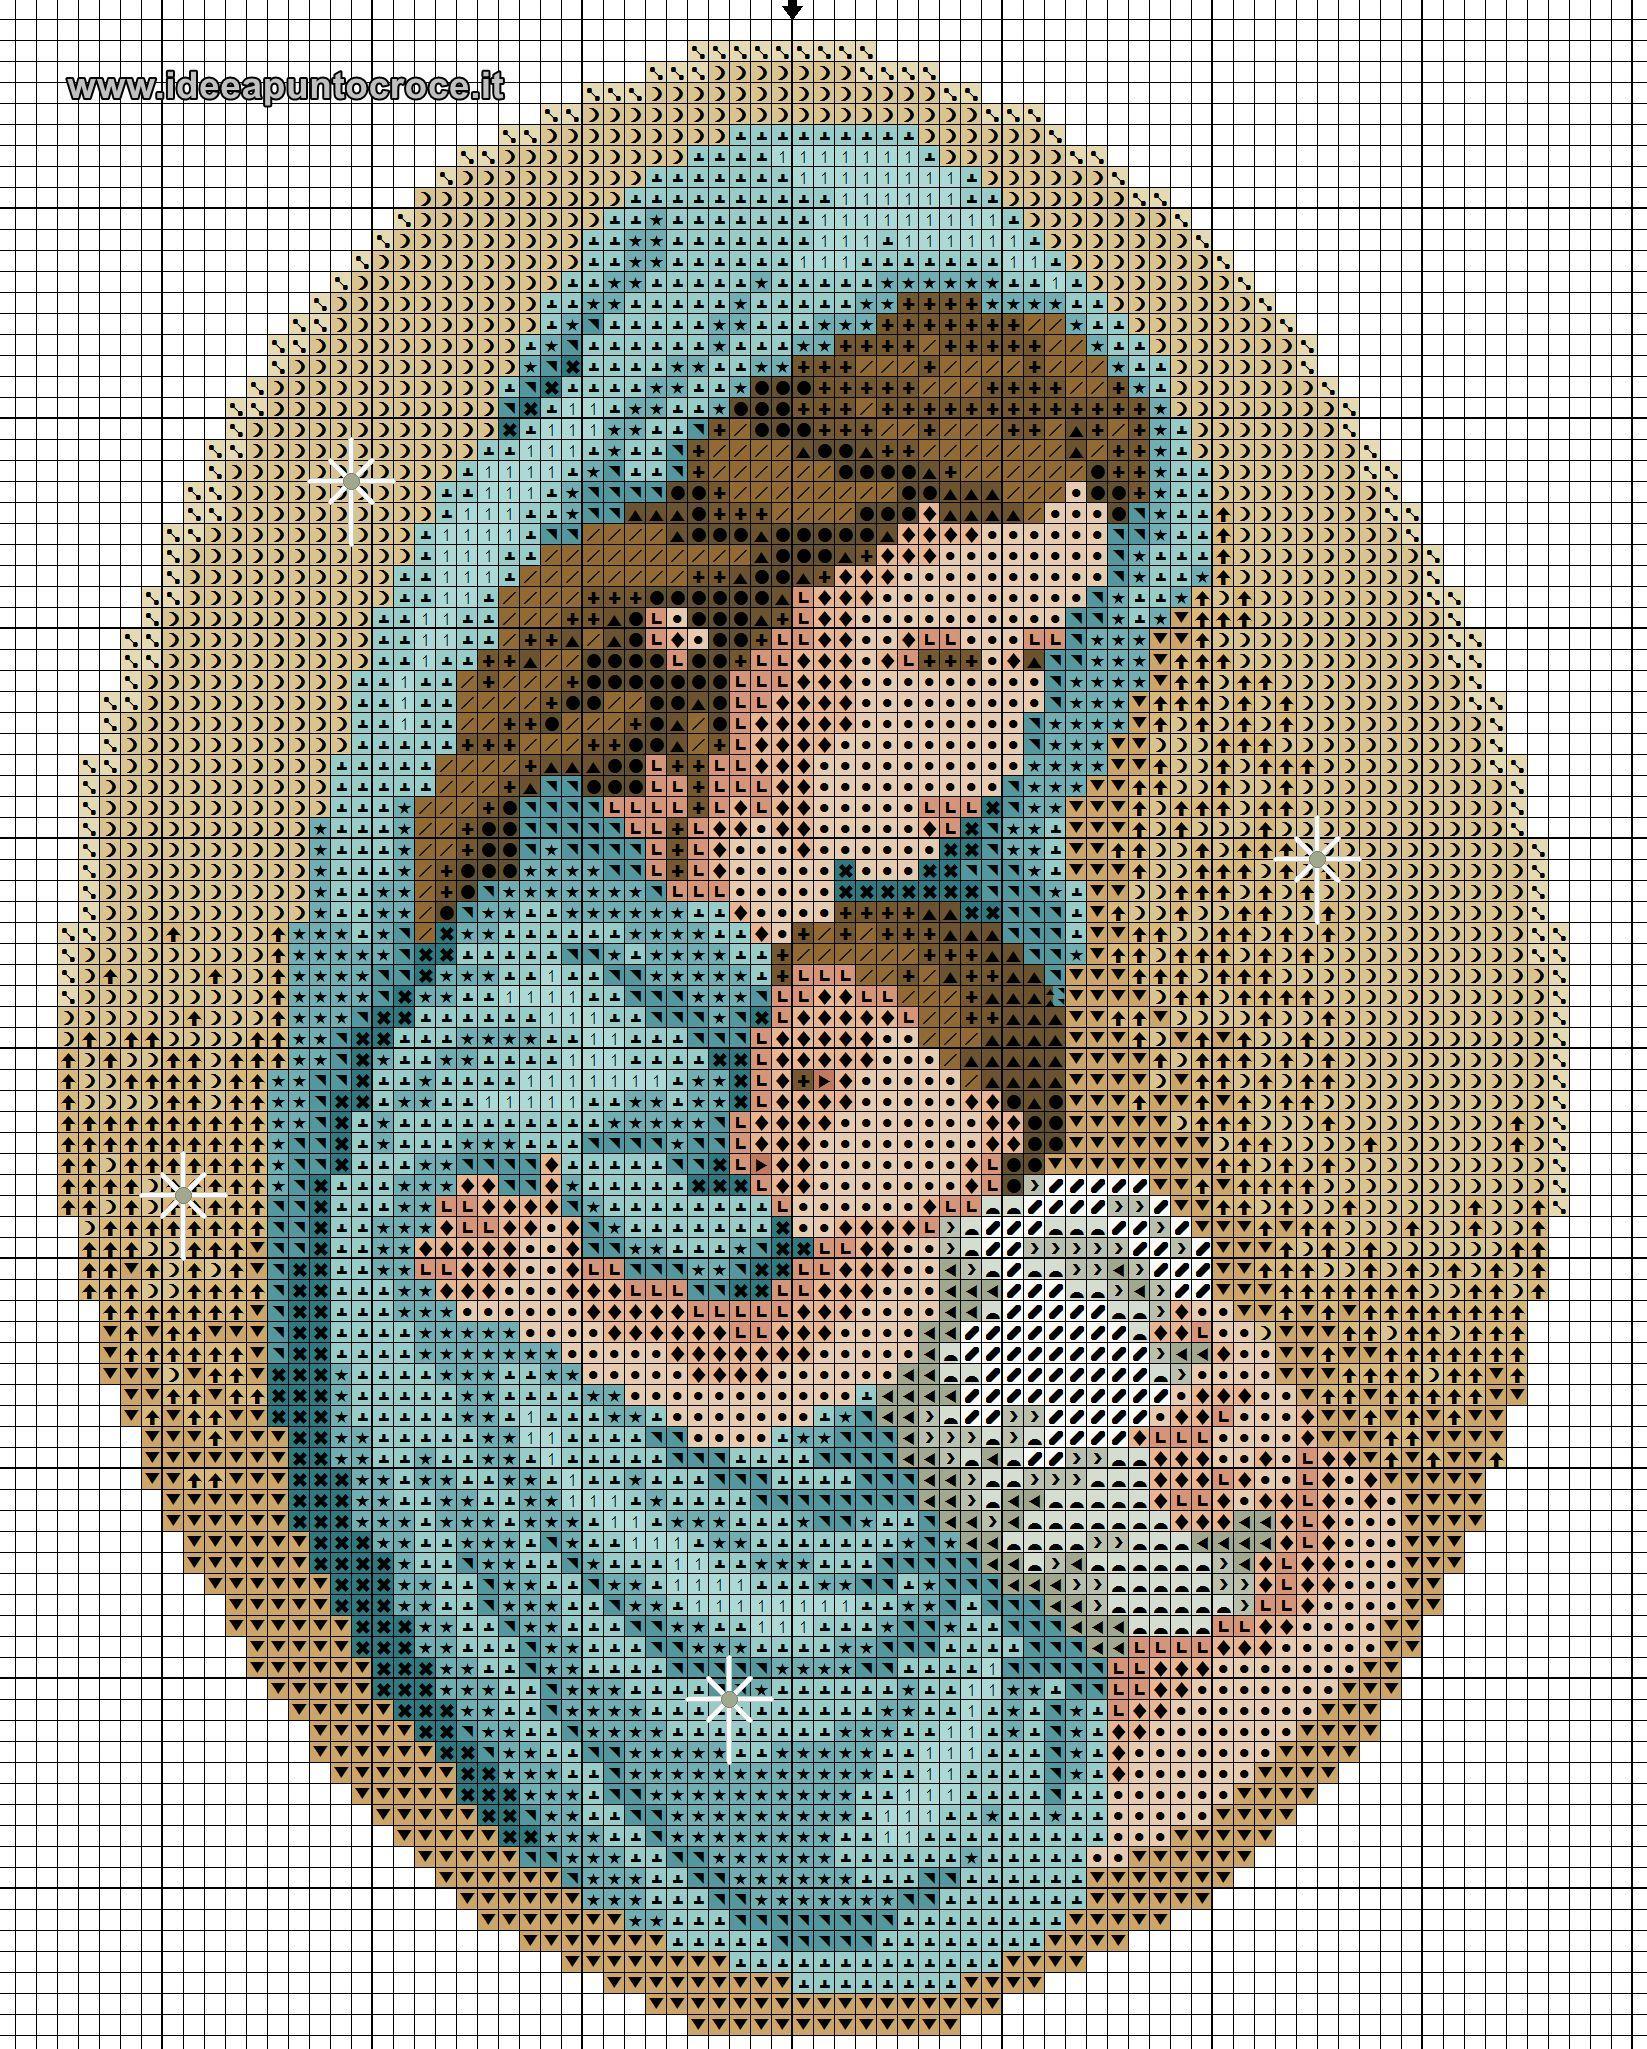 Schema punto croce madonna con bambino patrones de punto for Punto croce immagini